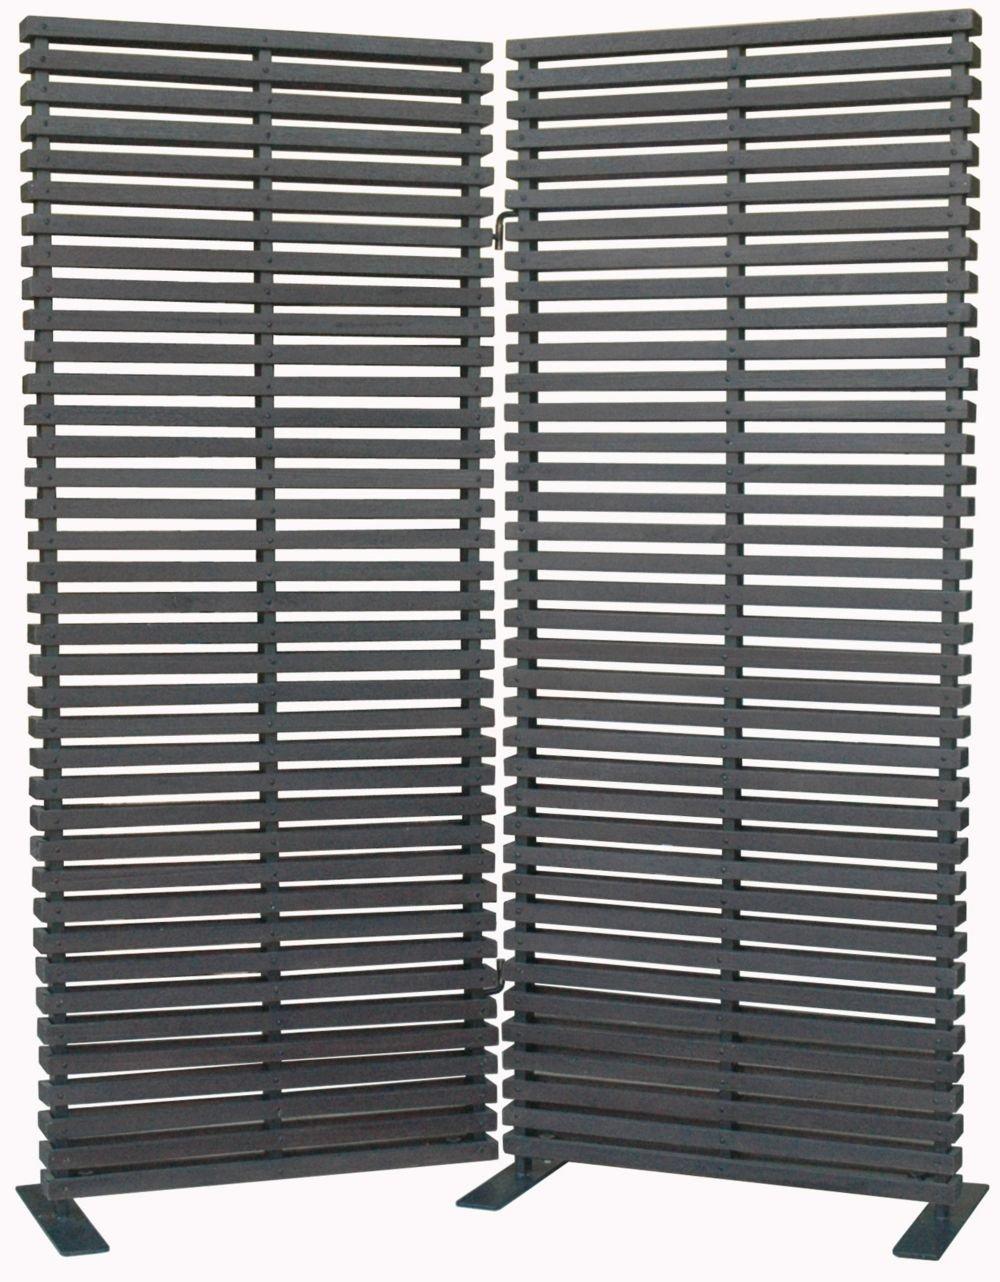 Dasha Room Divider Black Dimensions: 60''W x 3''D x 72''H Weight: 105 lbs